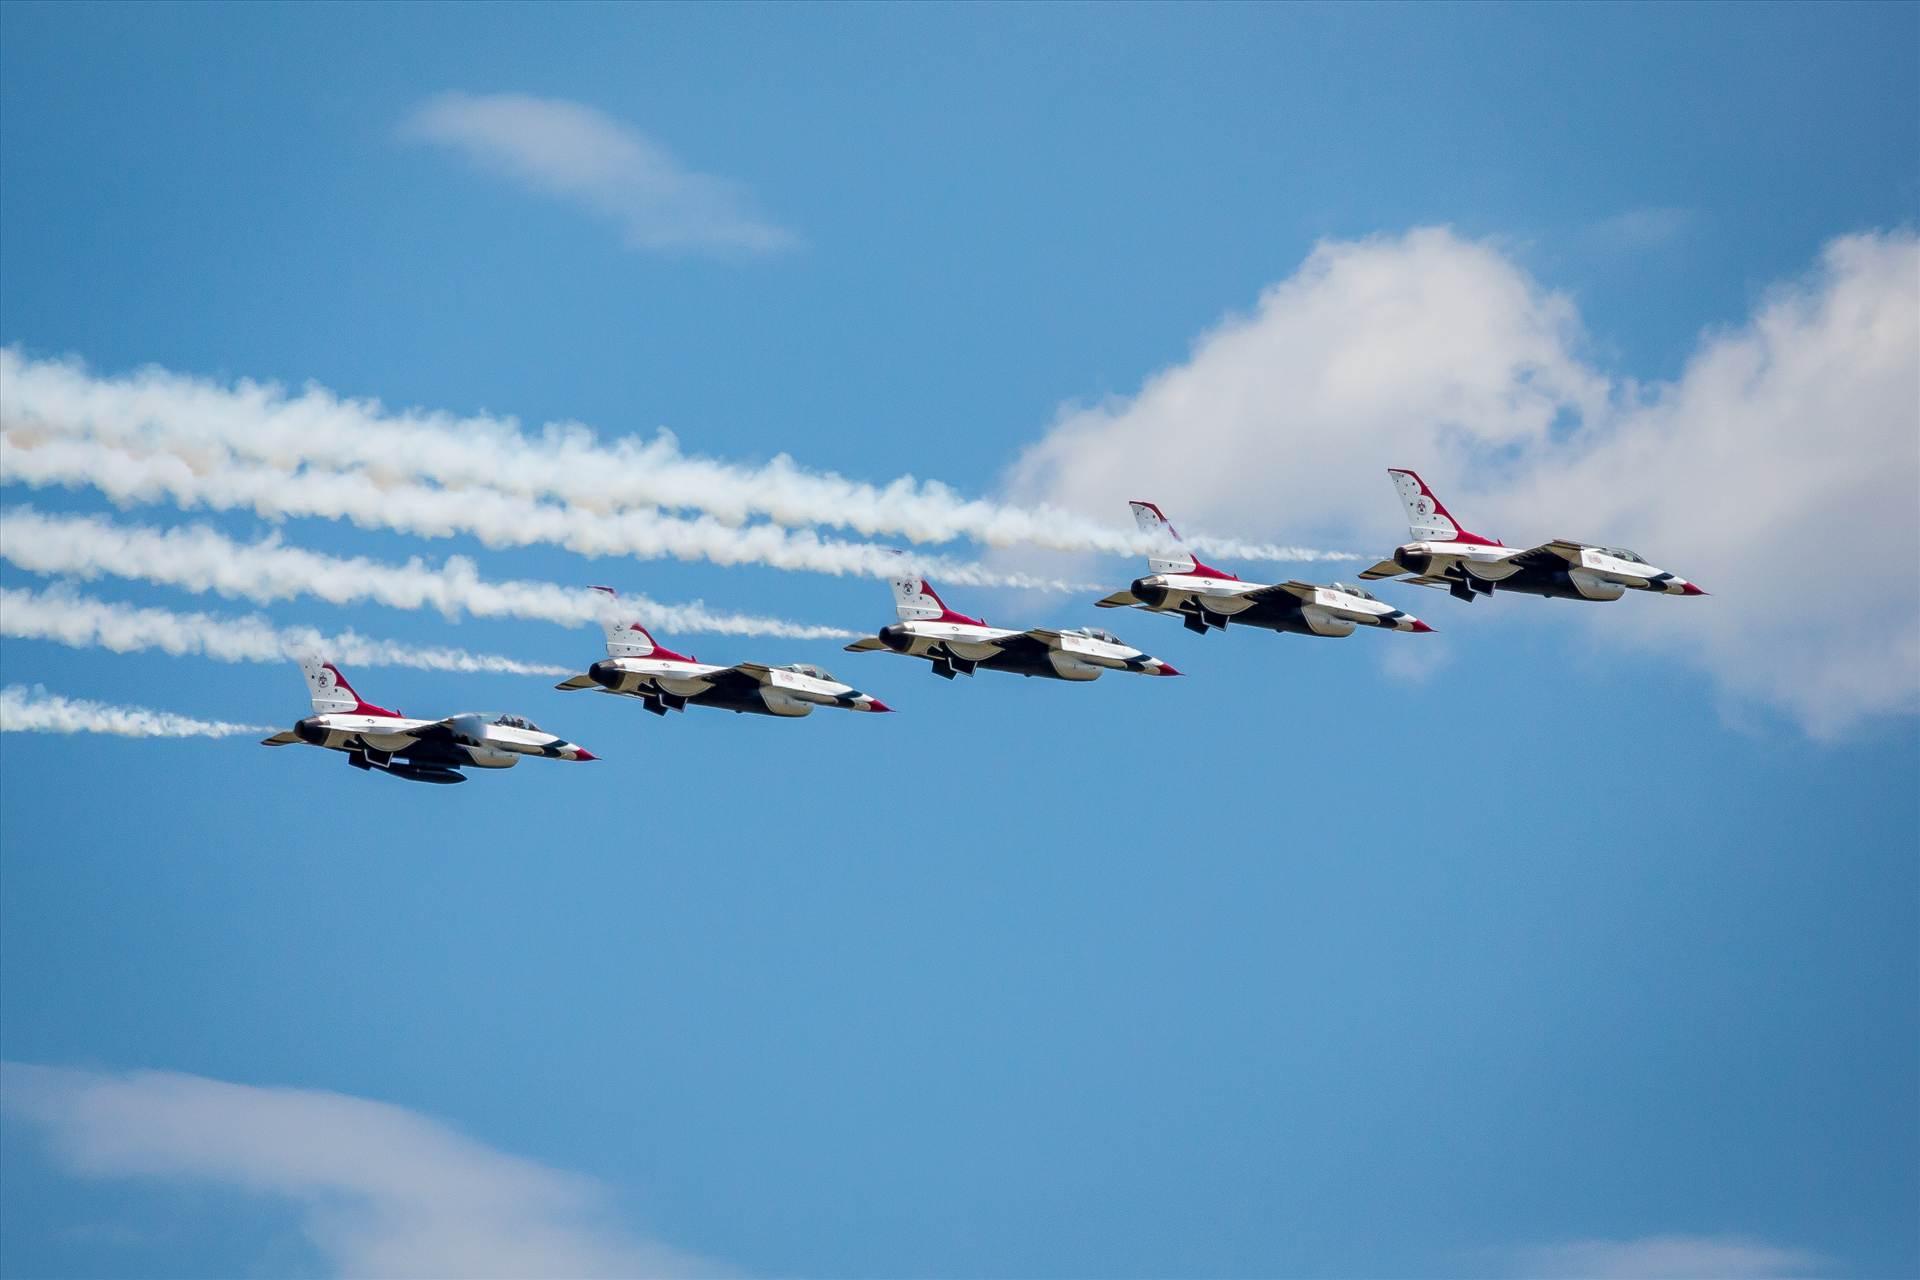 USAF Thunderbirds 6 -  by D Scott Smith